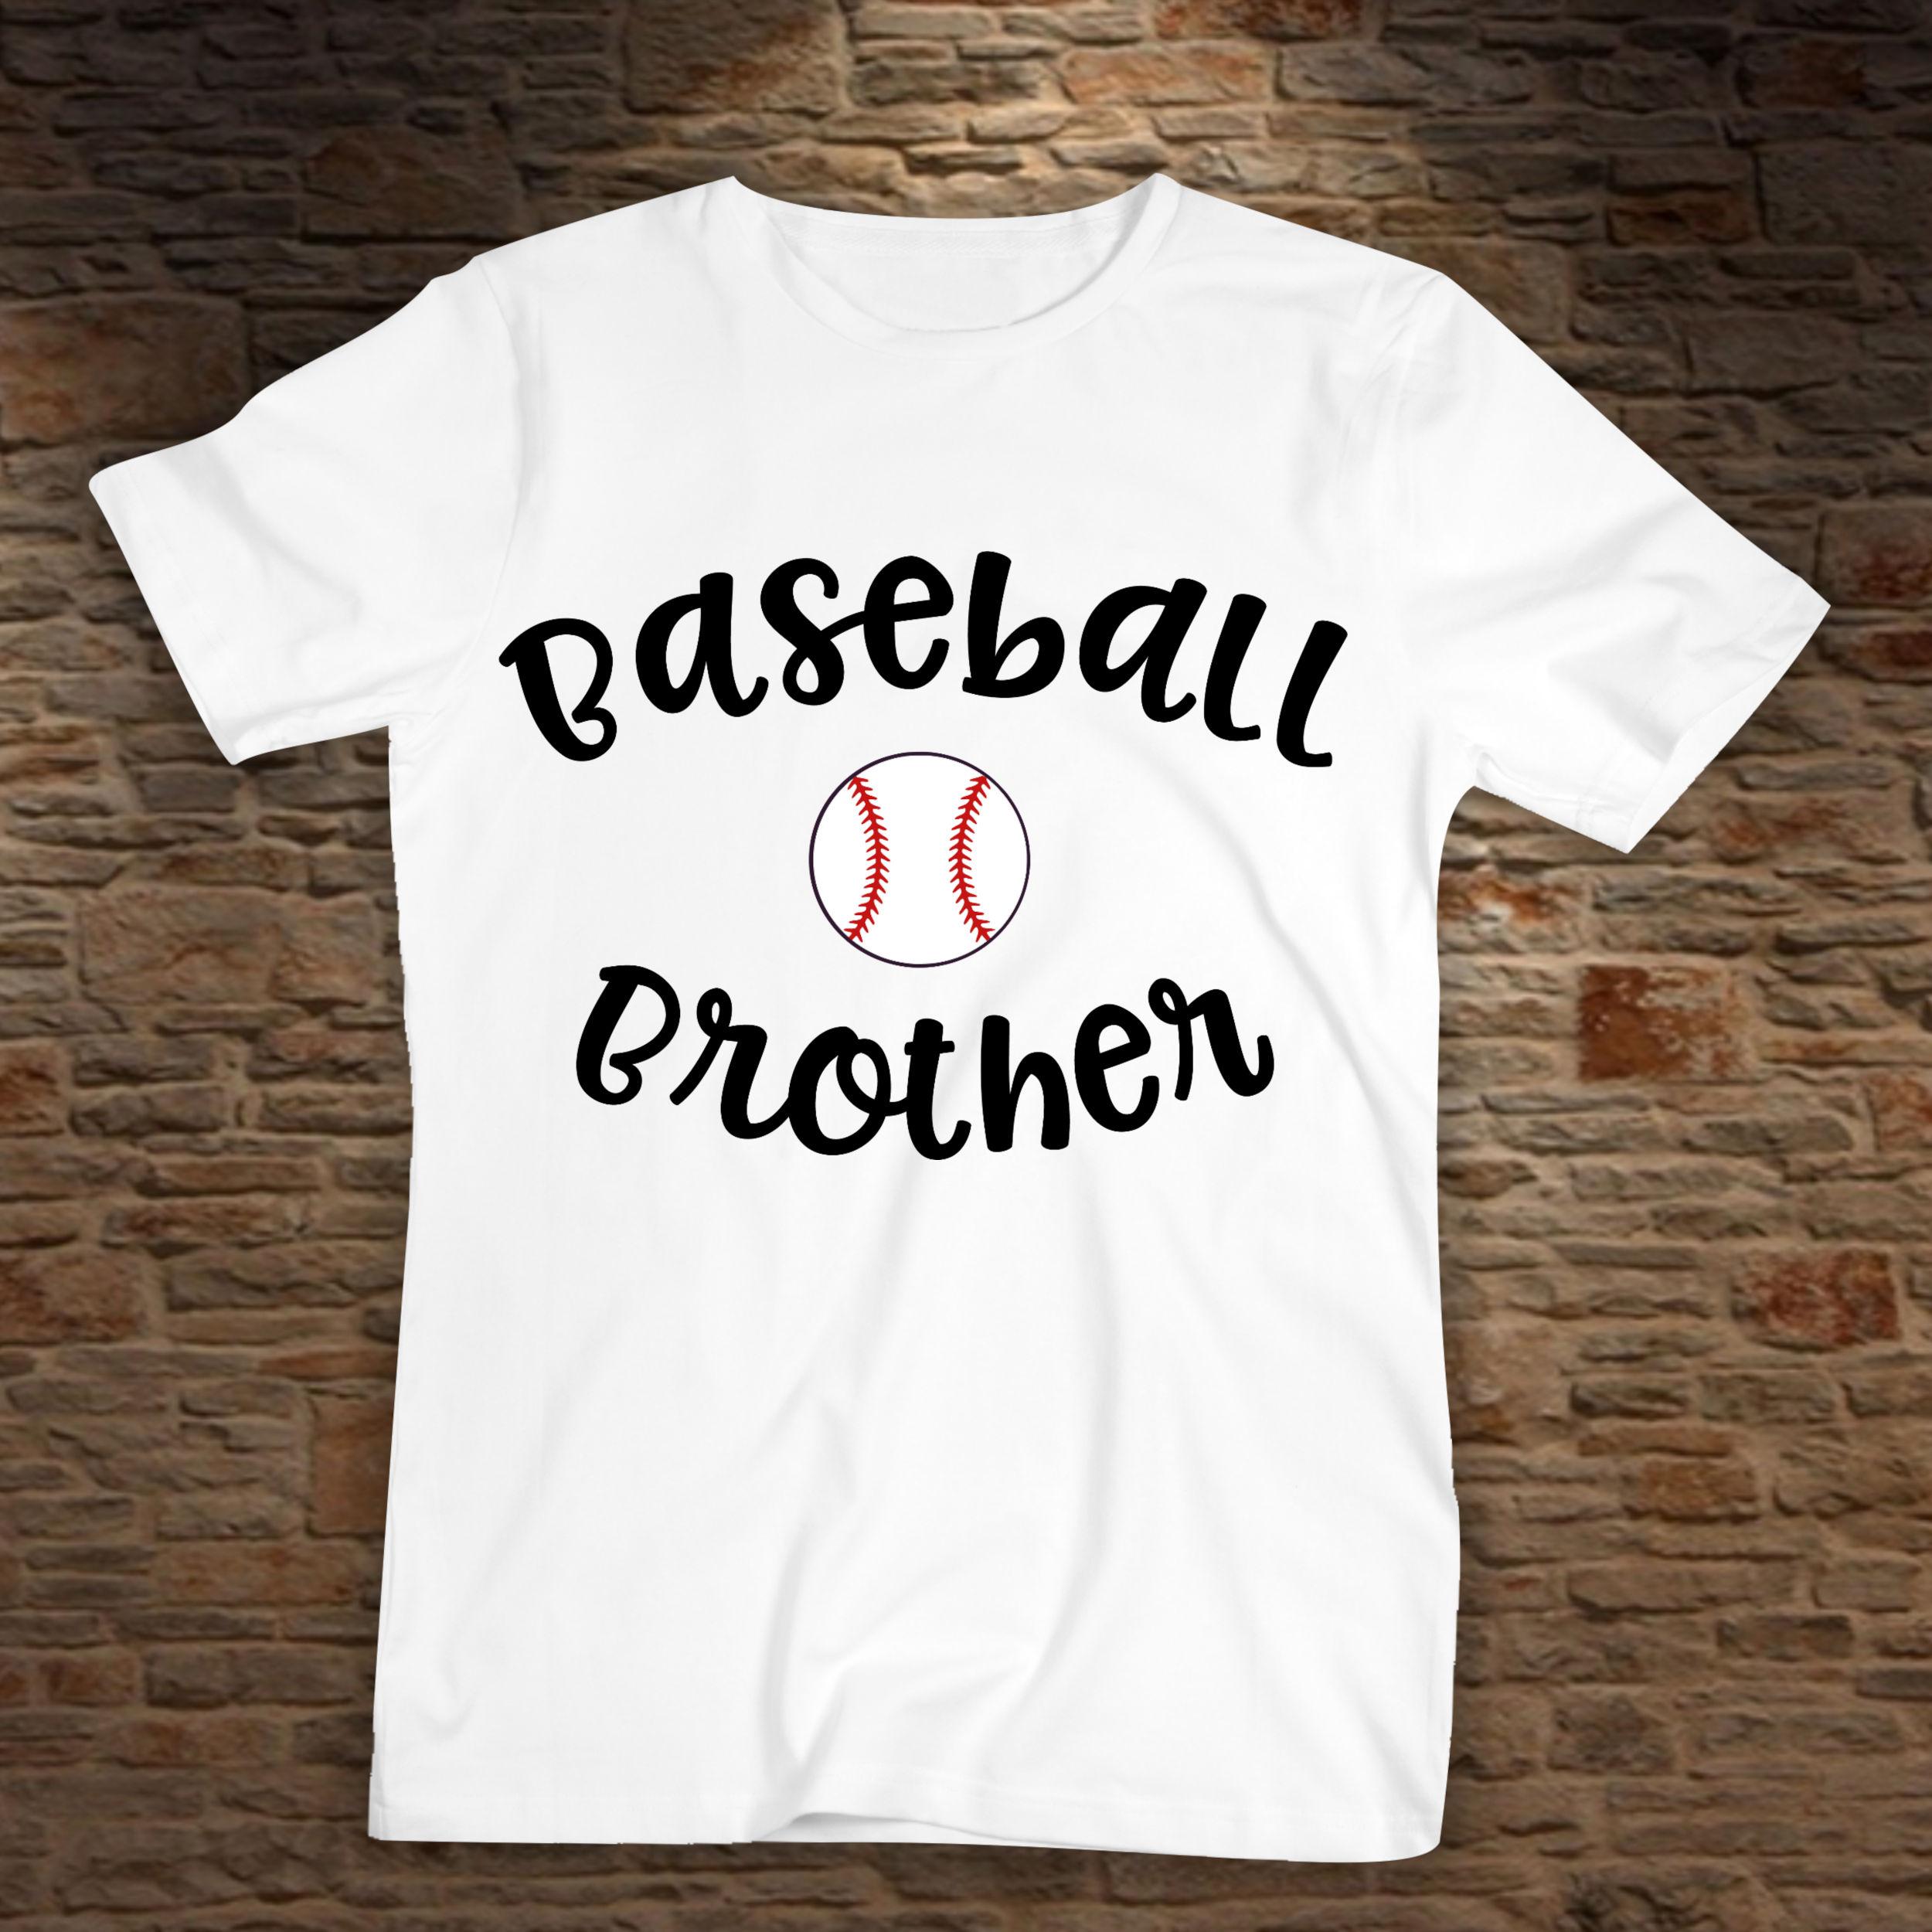 Baseball SVG Bundle - Includes 12 Baseball Designs example image 12